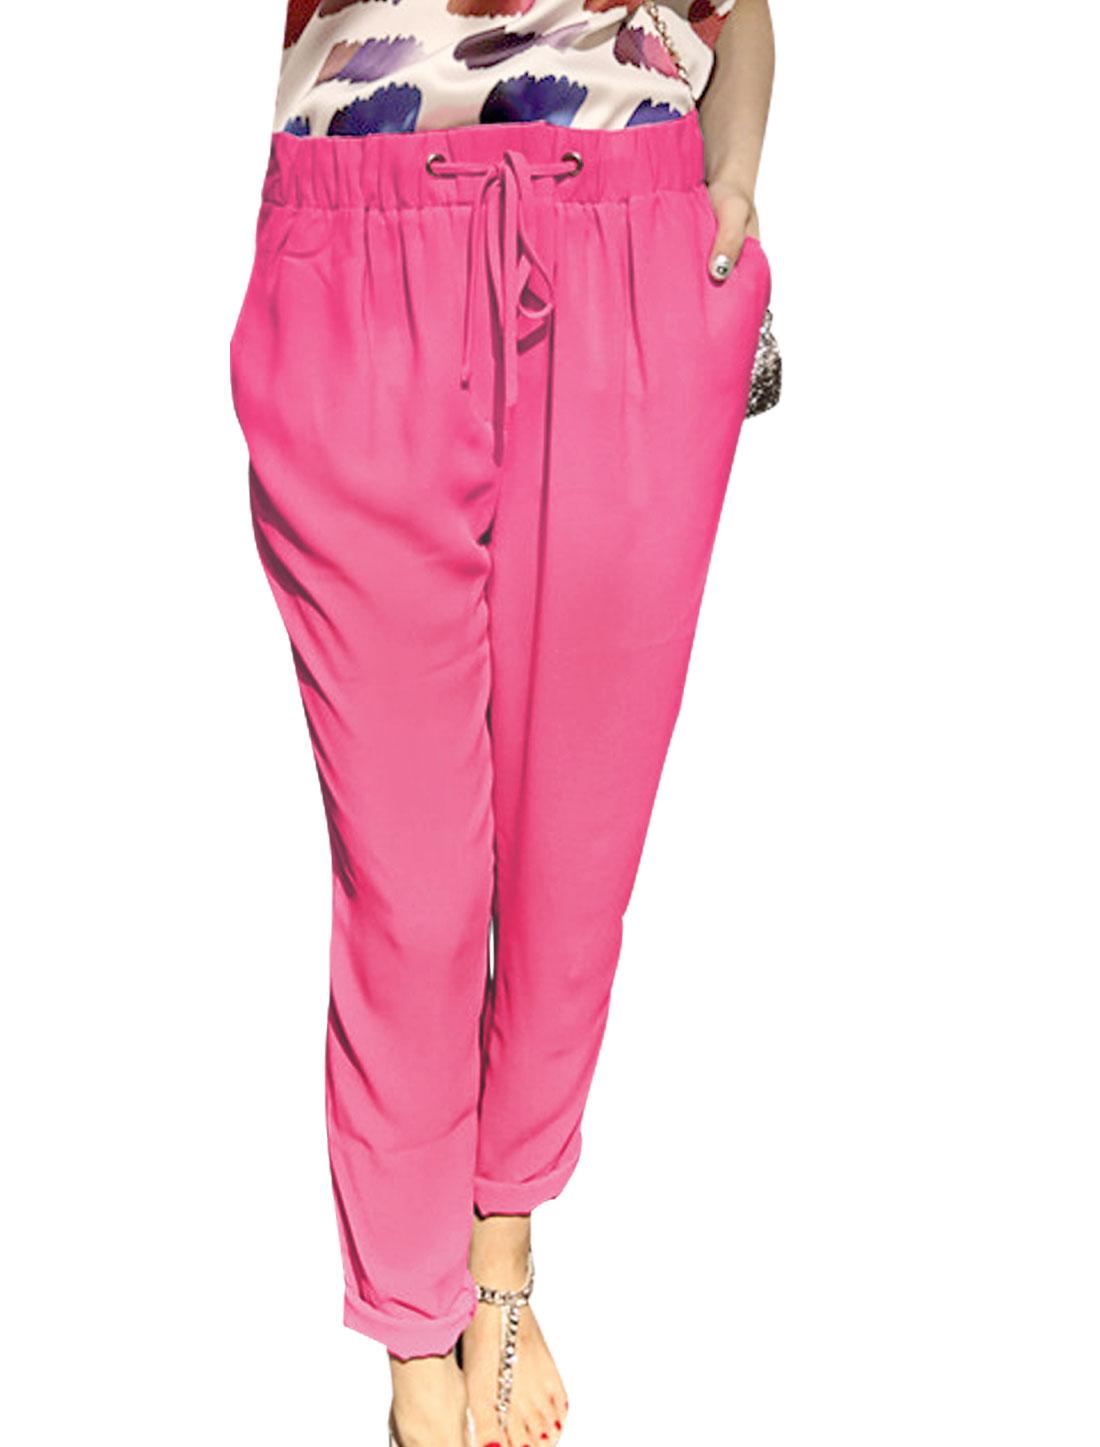 Women Double Slant Pockets Semi Sheer Leisure Cropped Pants Fuchsia XS